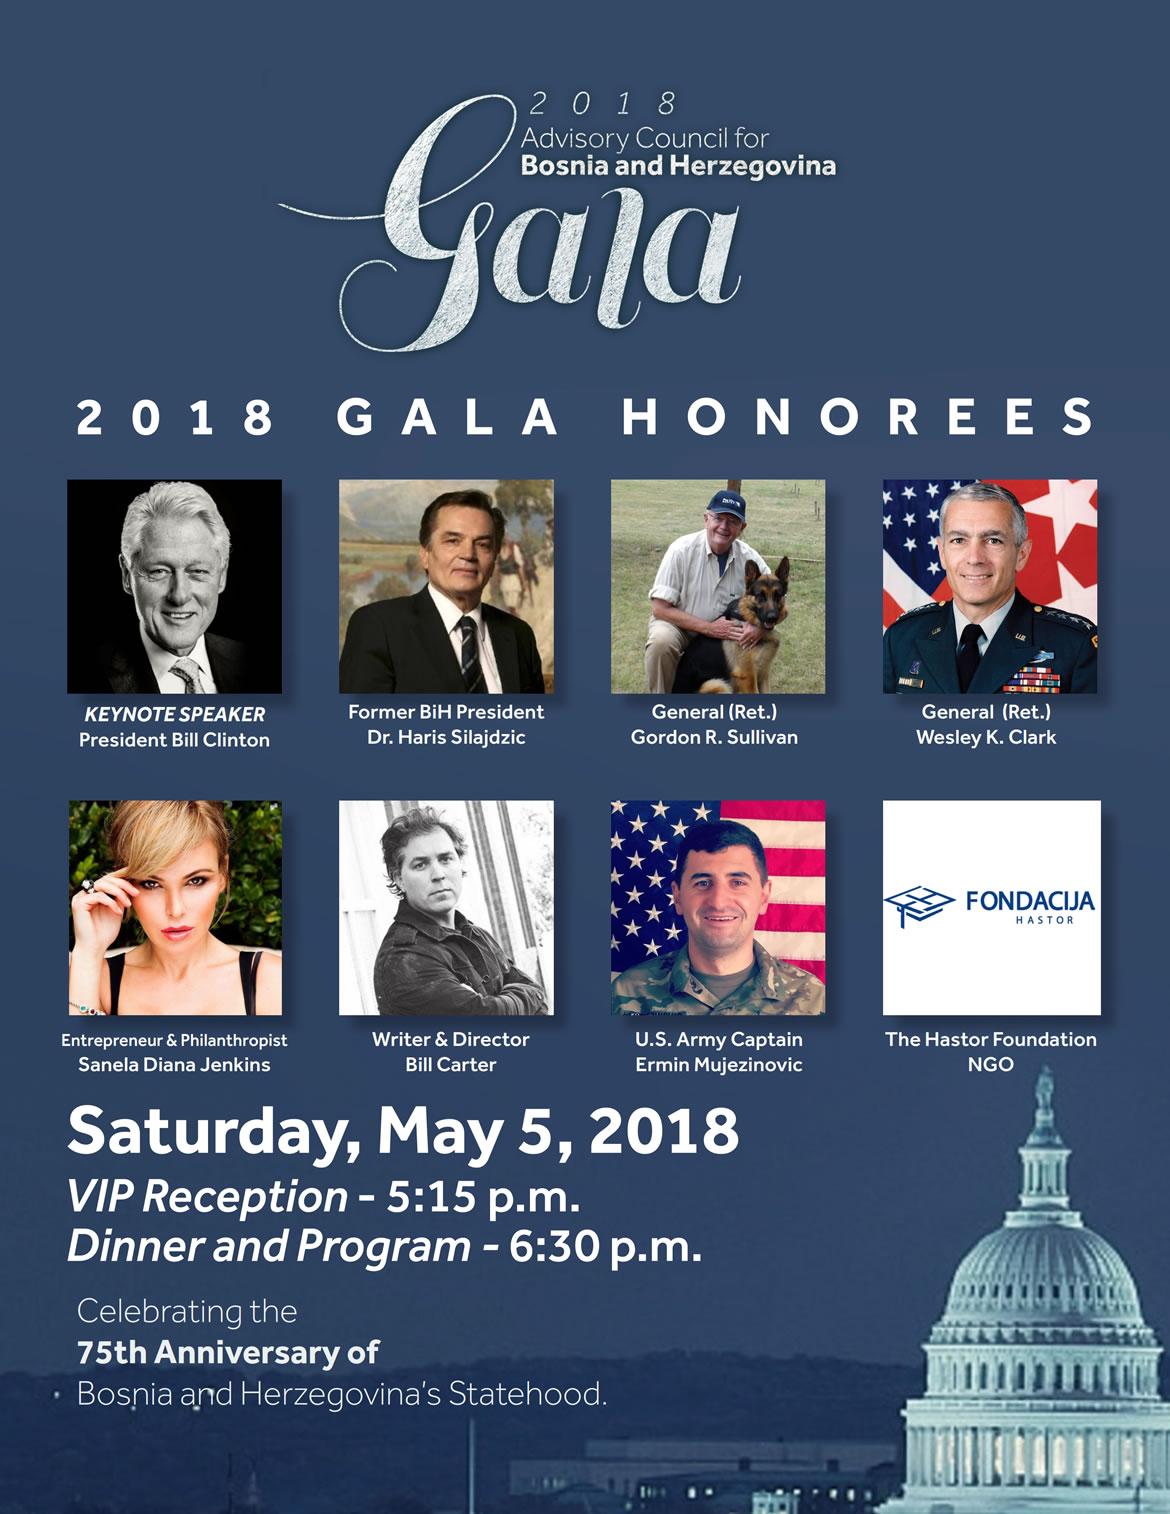 ACBH-2018-Gala-Honorees